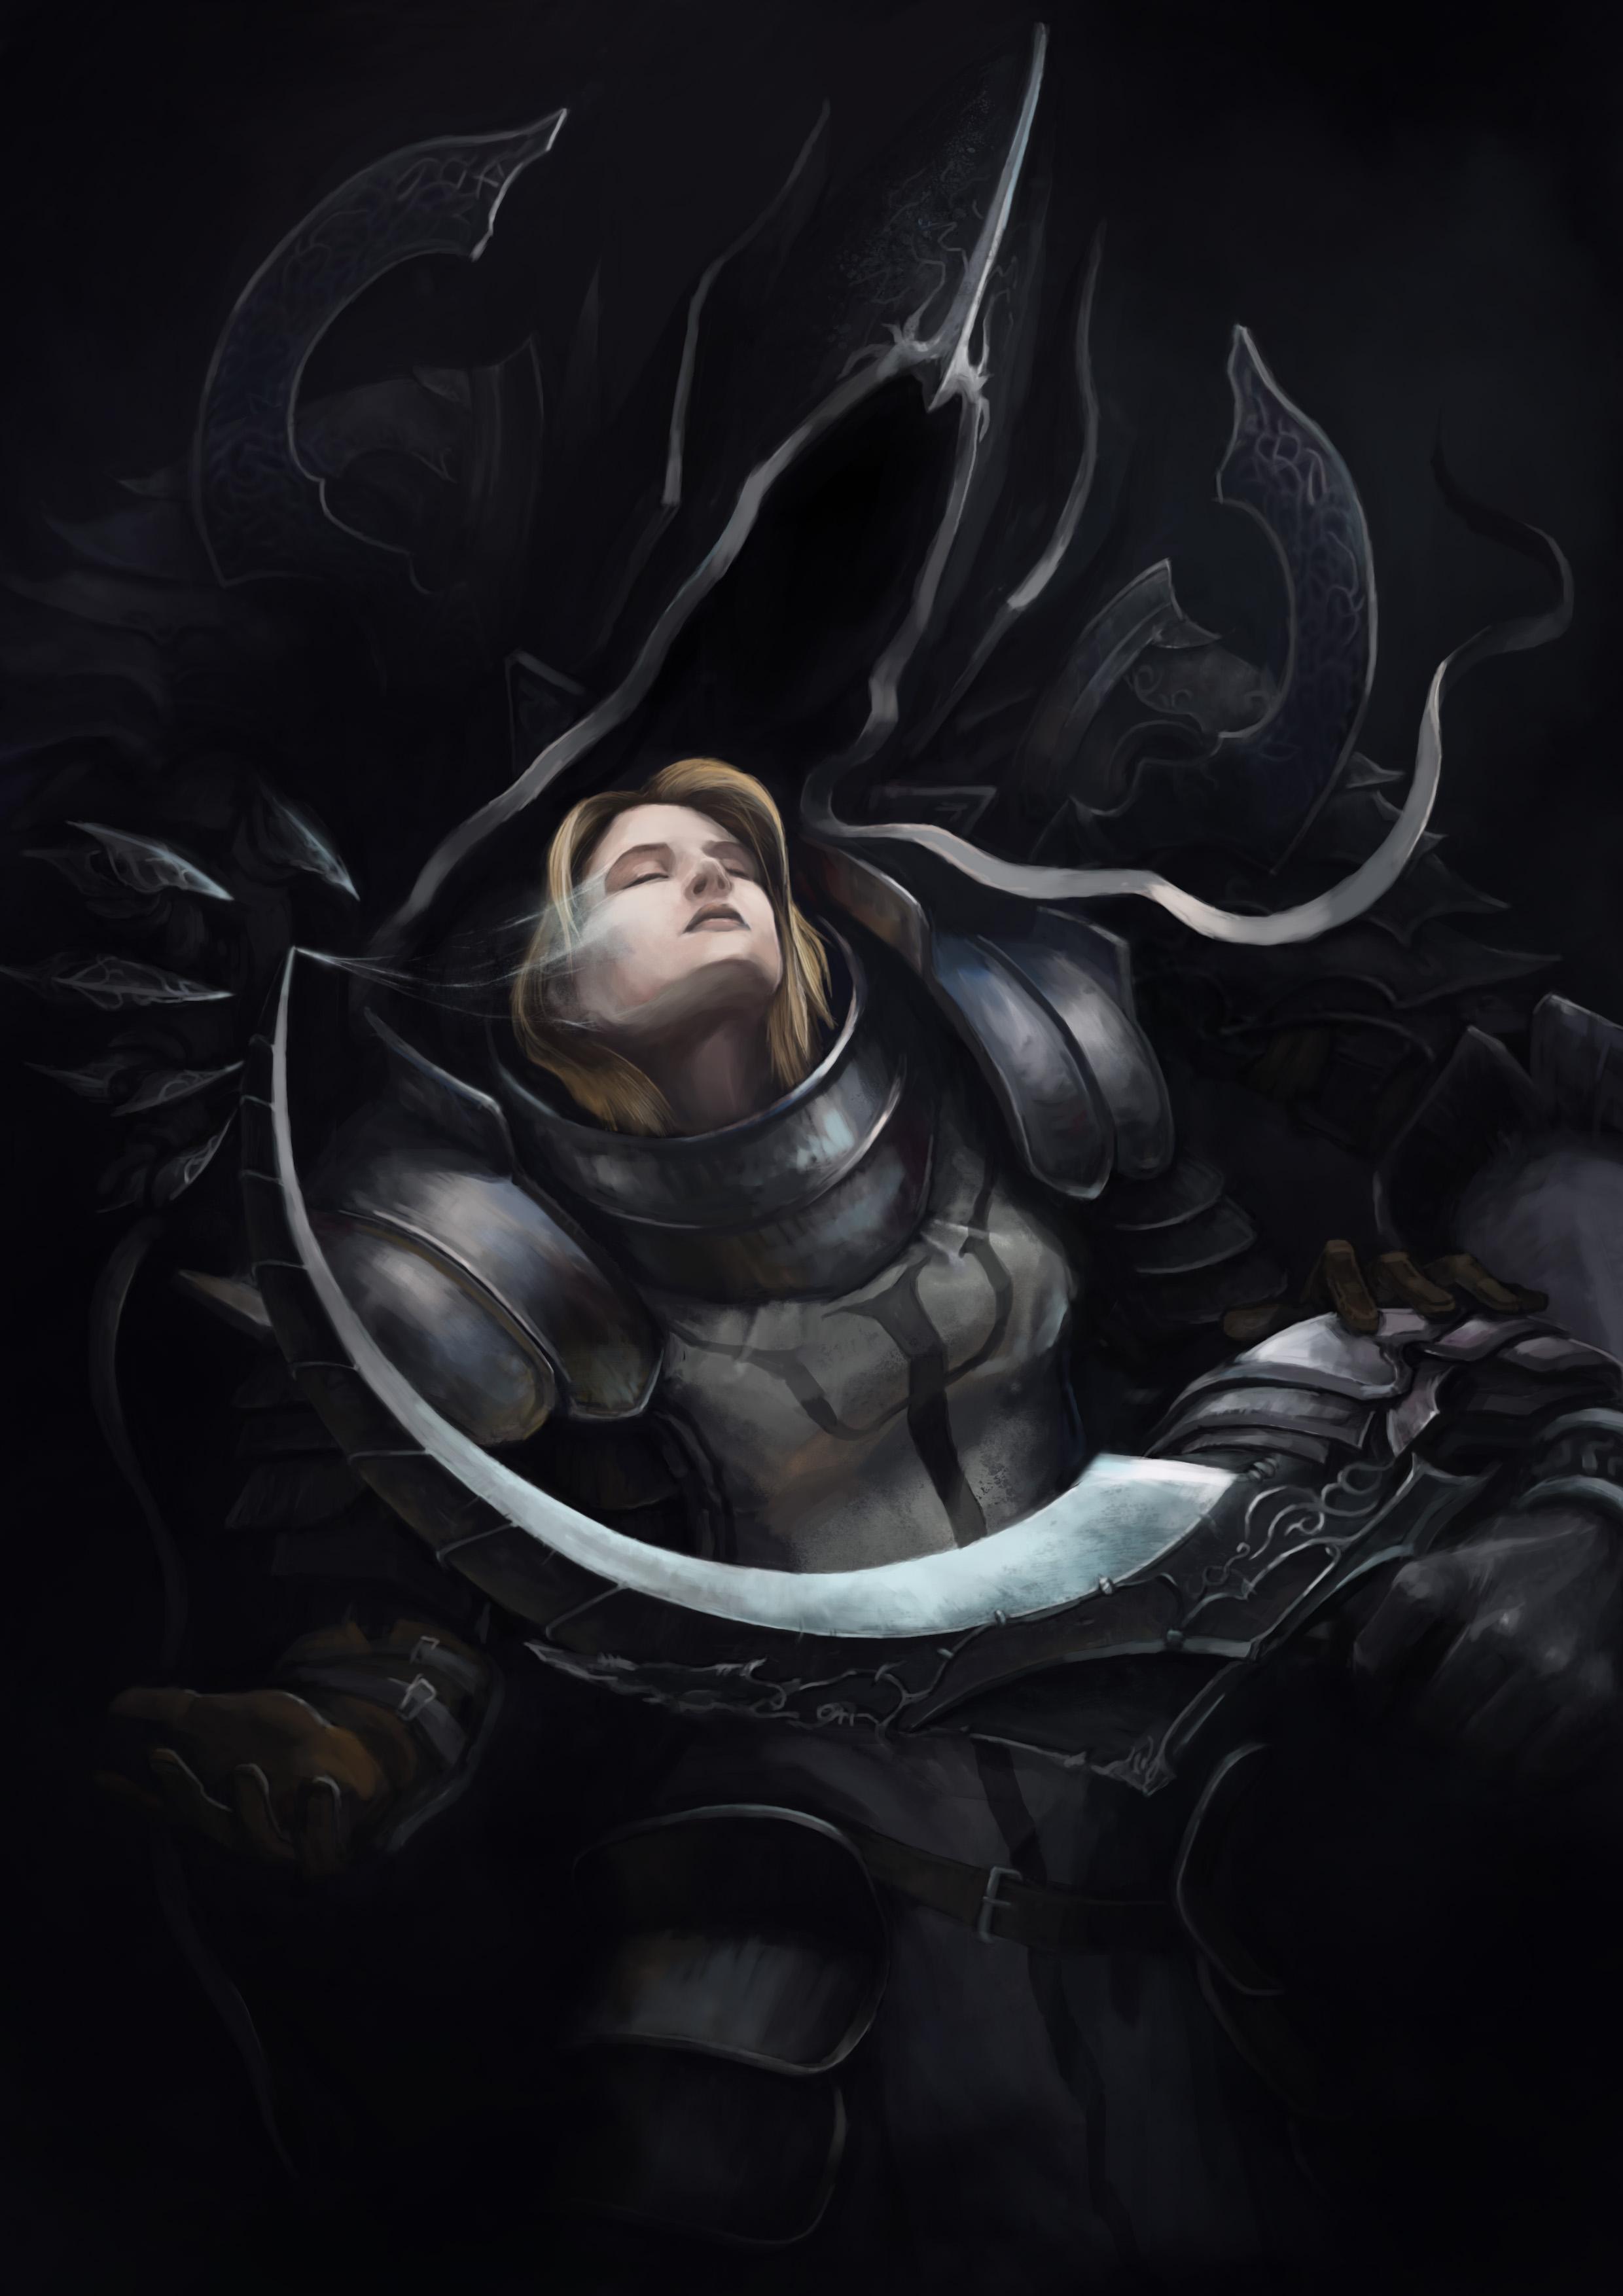 reaper of souls by MerrymindAndStivka